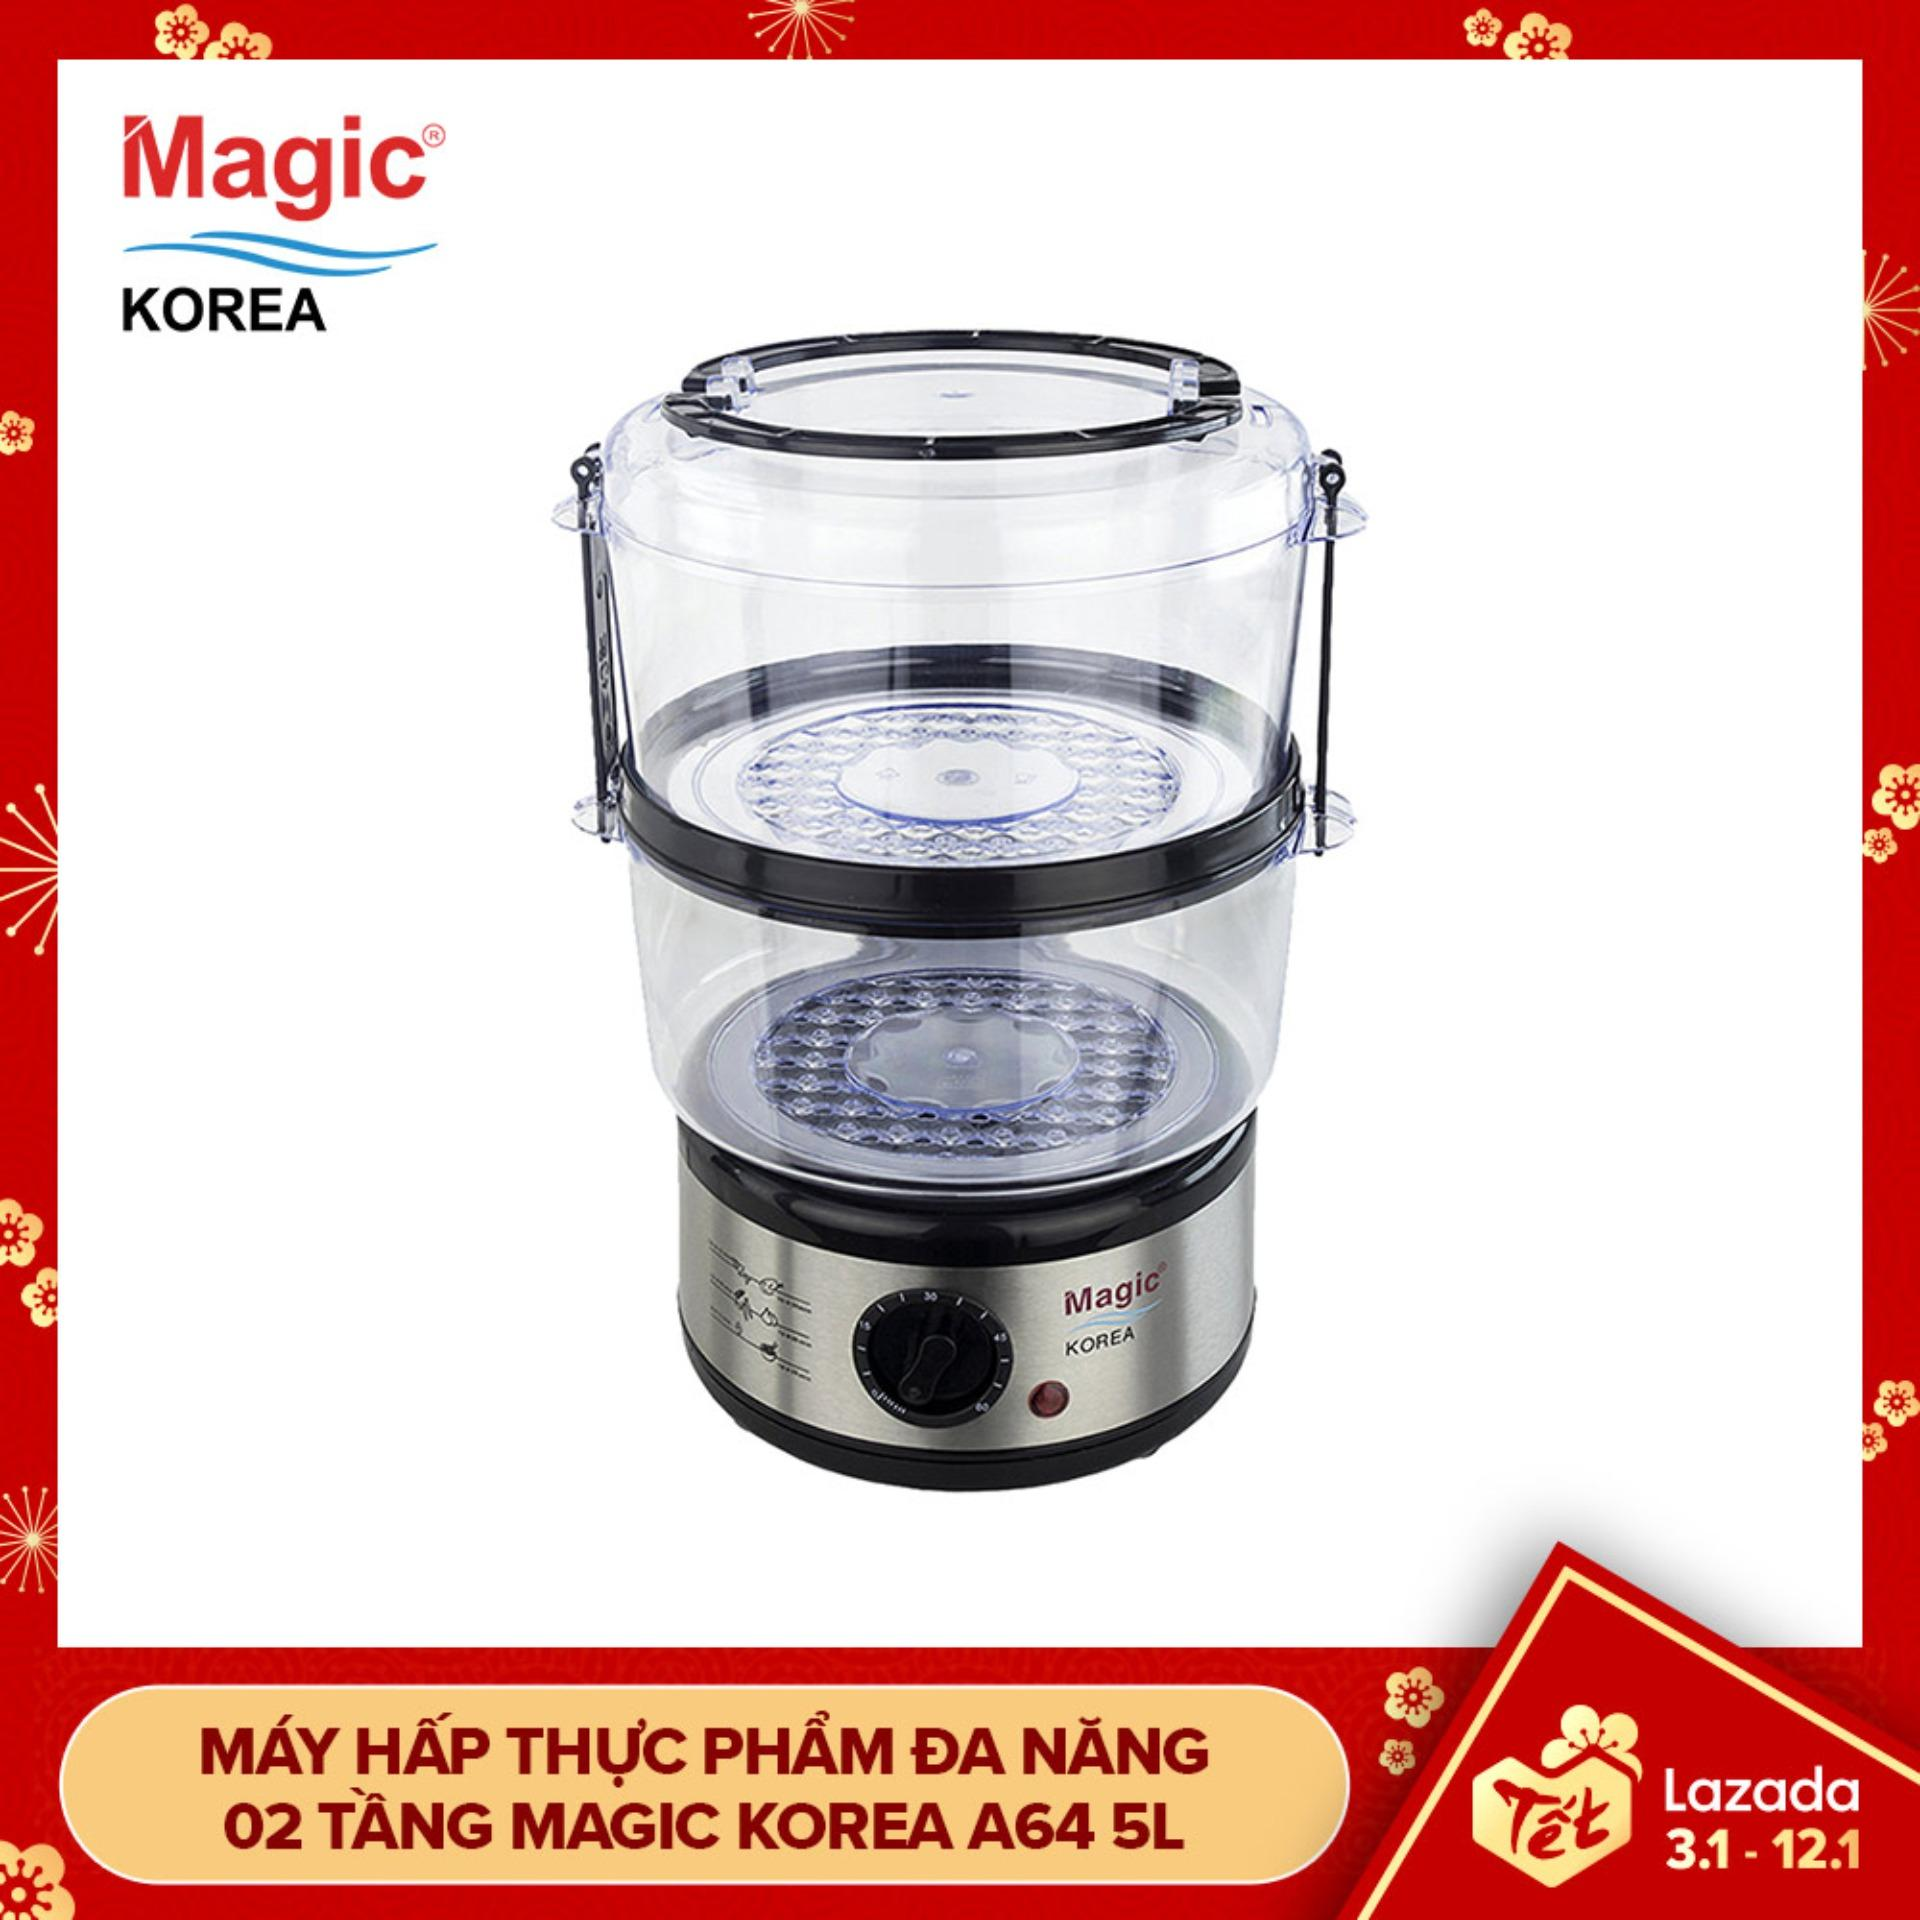 Máy hấp thực phẩm Magic Korea A64